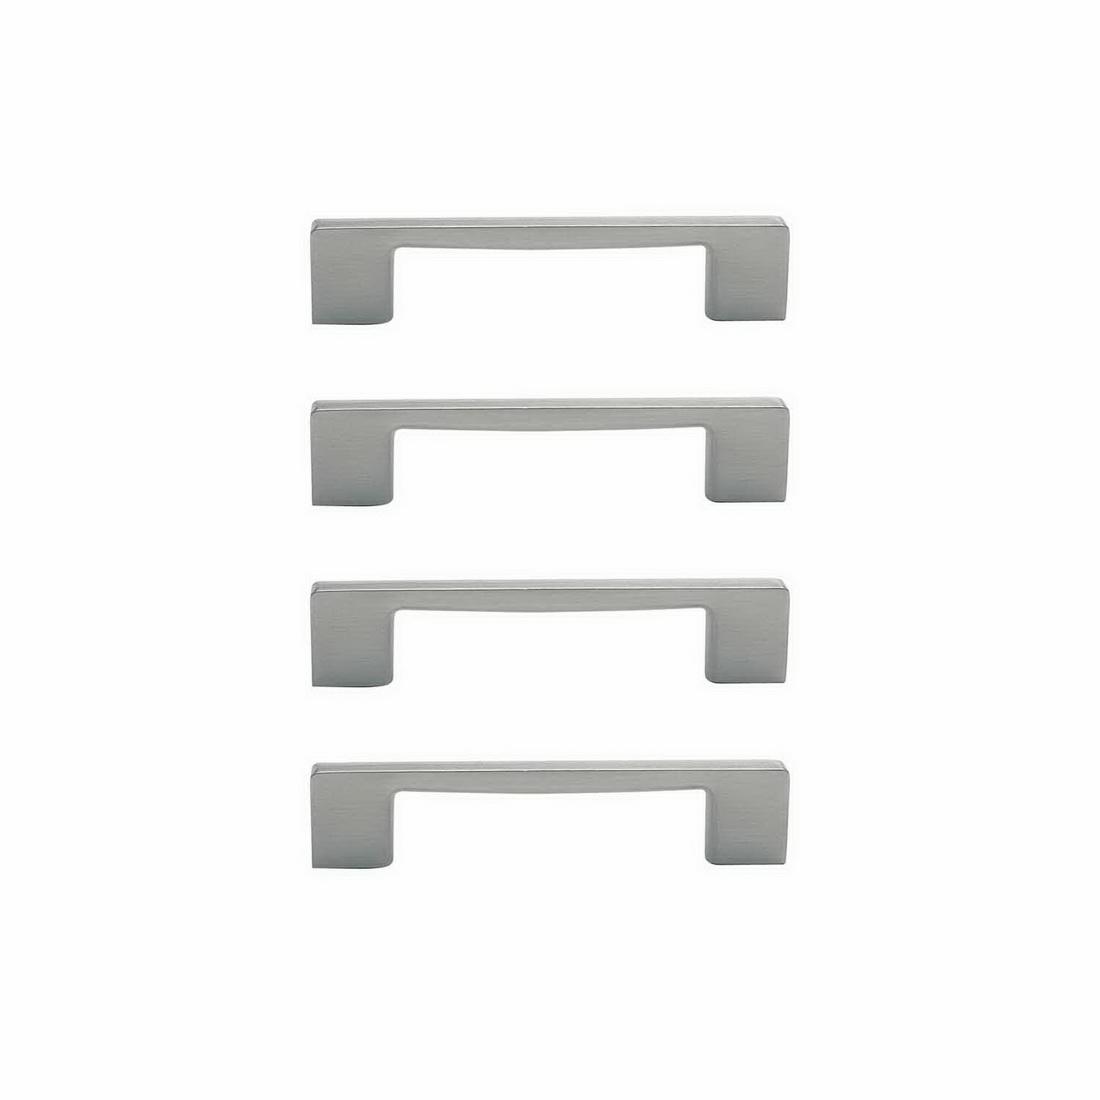 Marco Cabinet Handle 96mm Zinc Die-Cast Brushed Nickel 4 pack 6336-4-BN